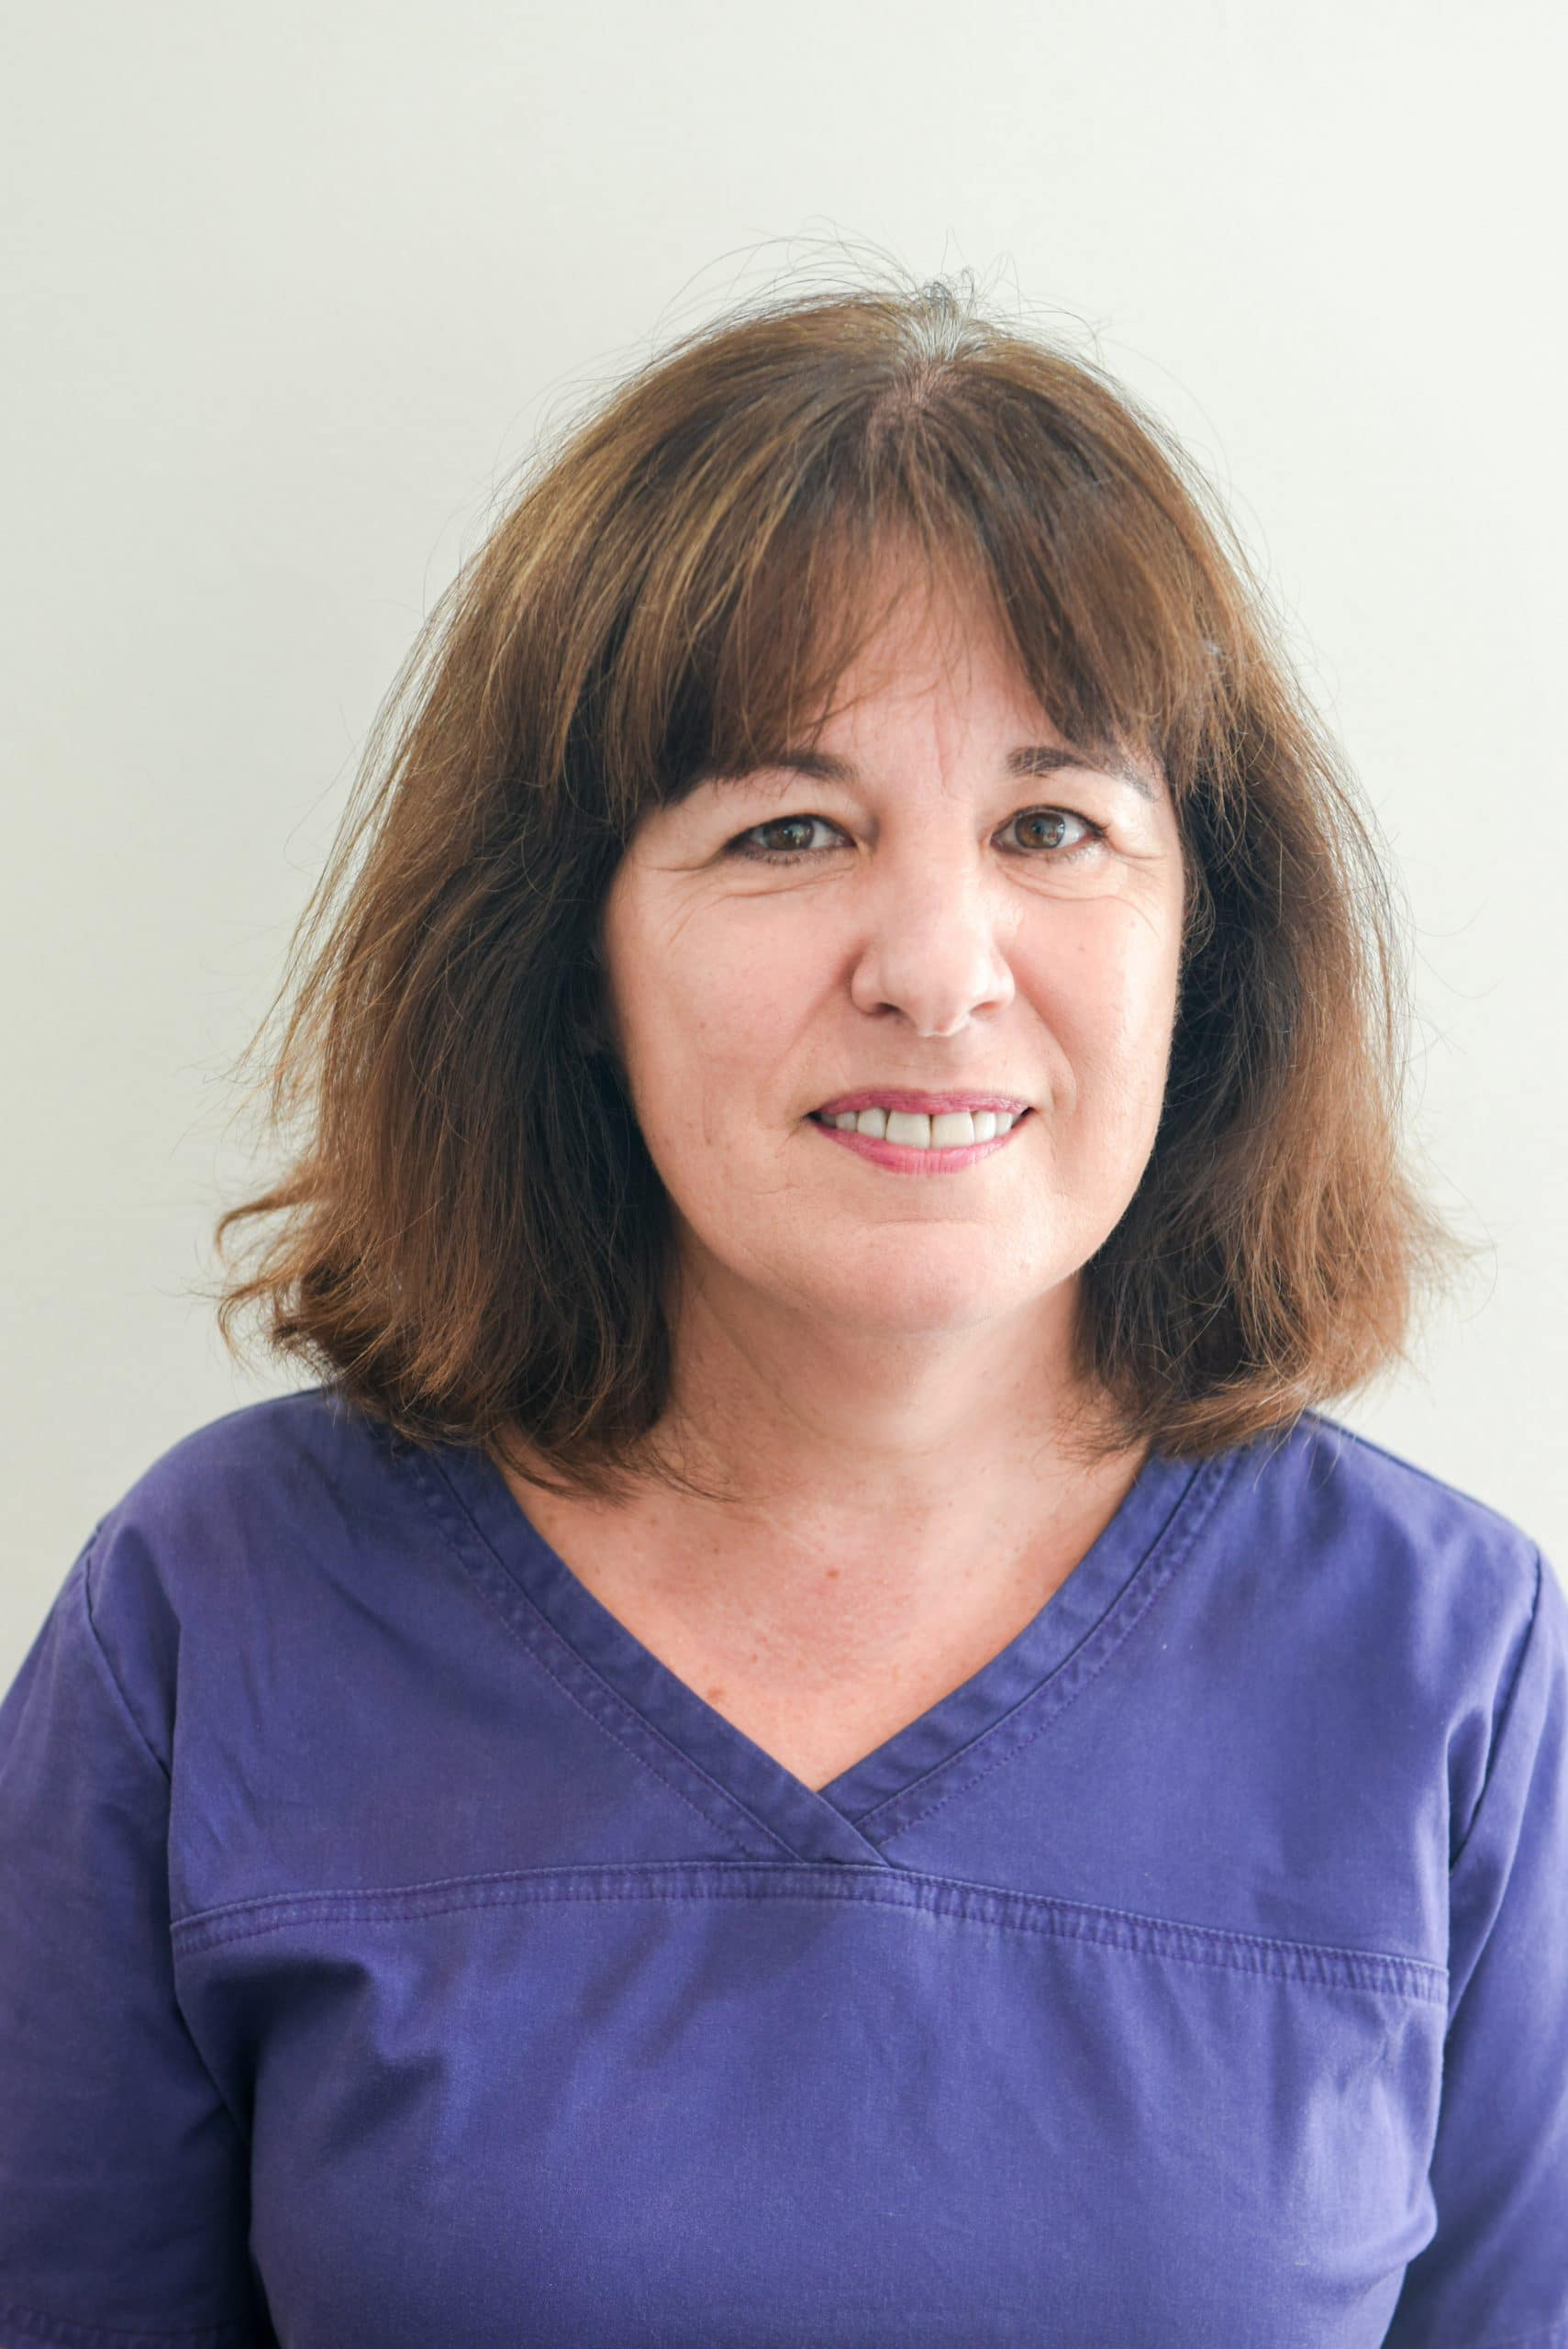 Christine Braglia